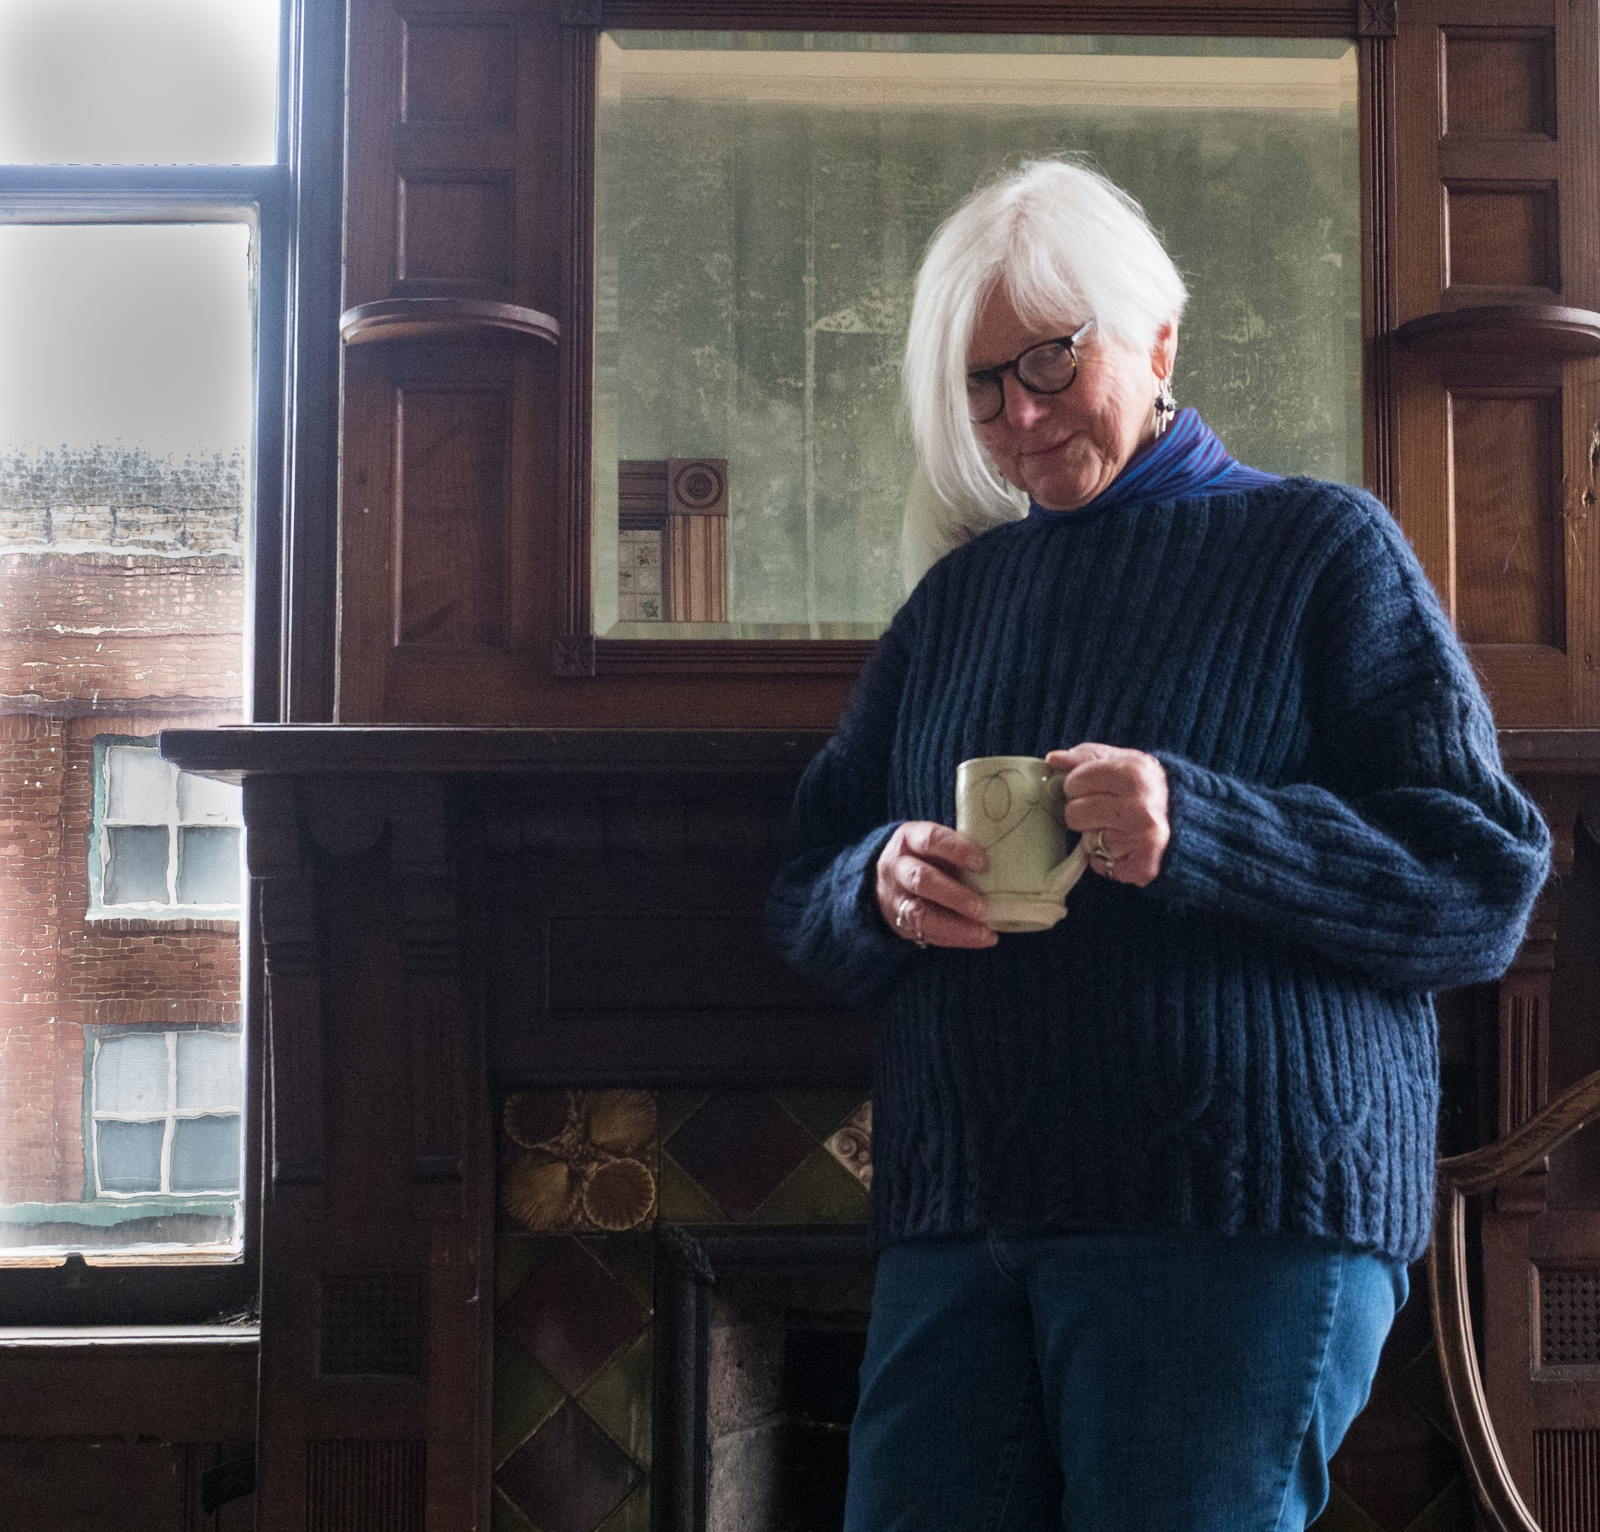 Falt lady smirking with cup.